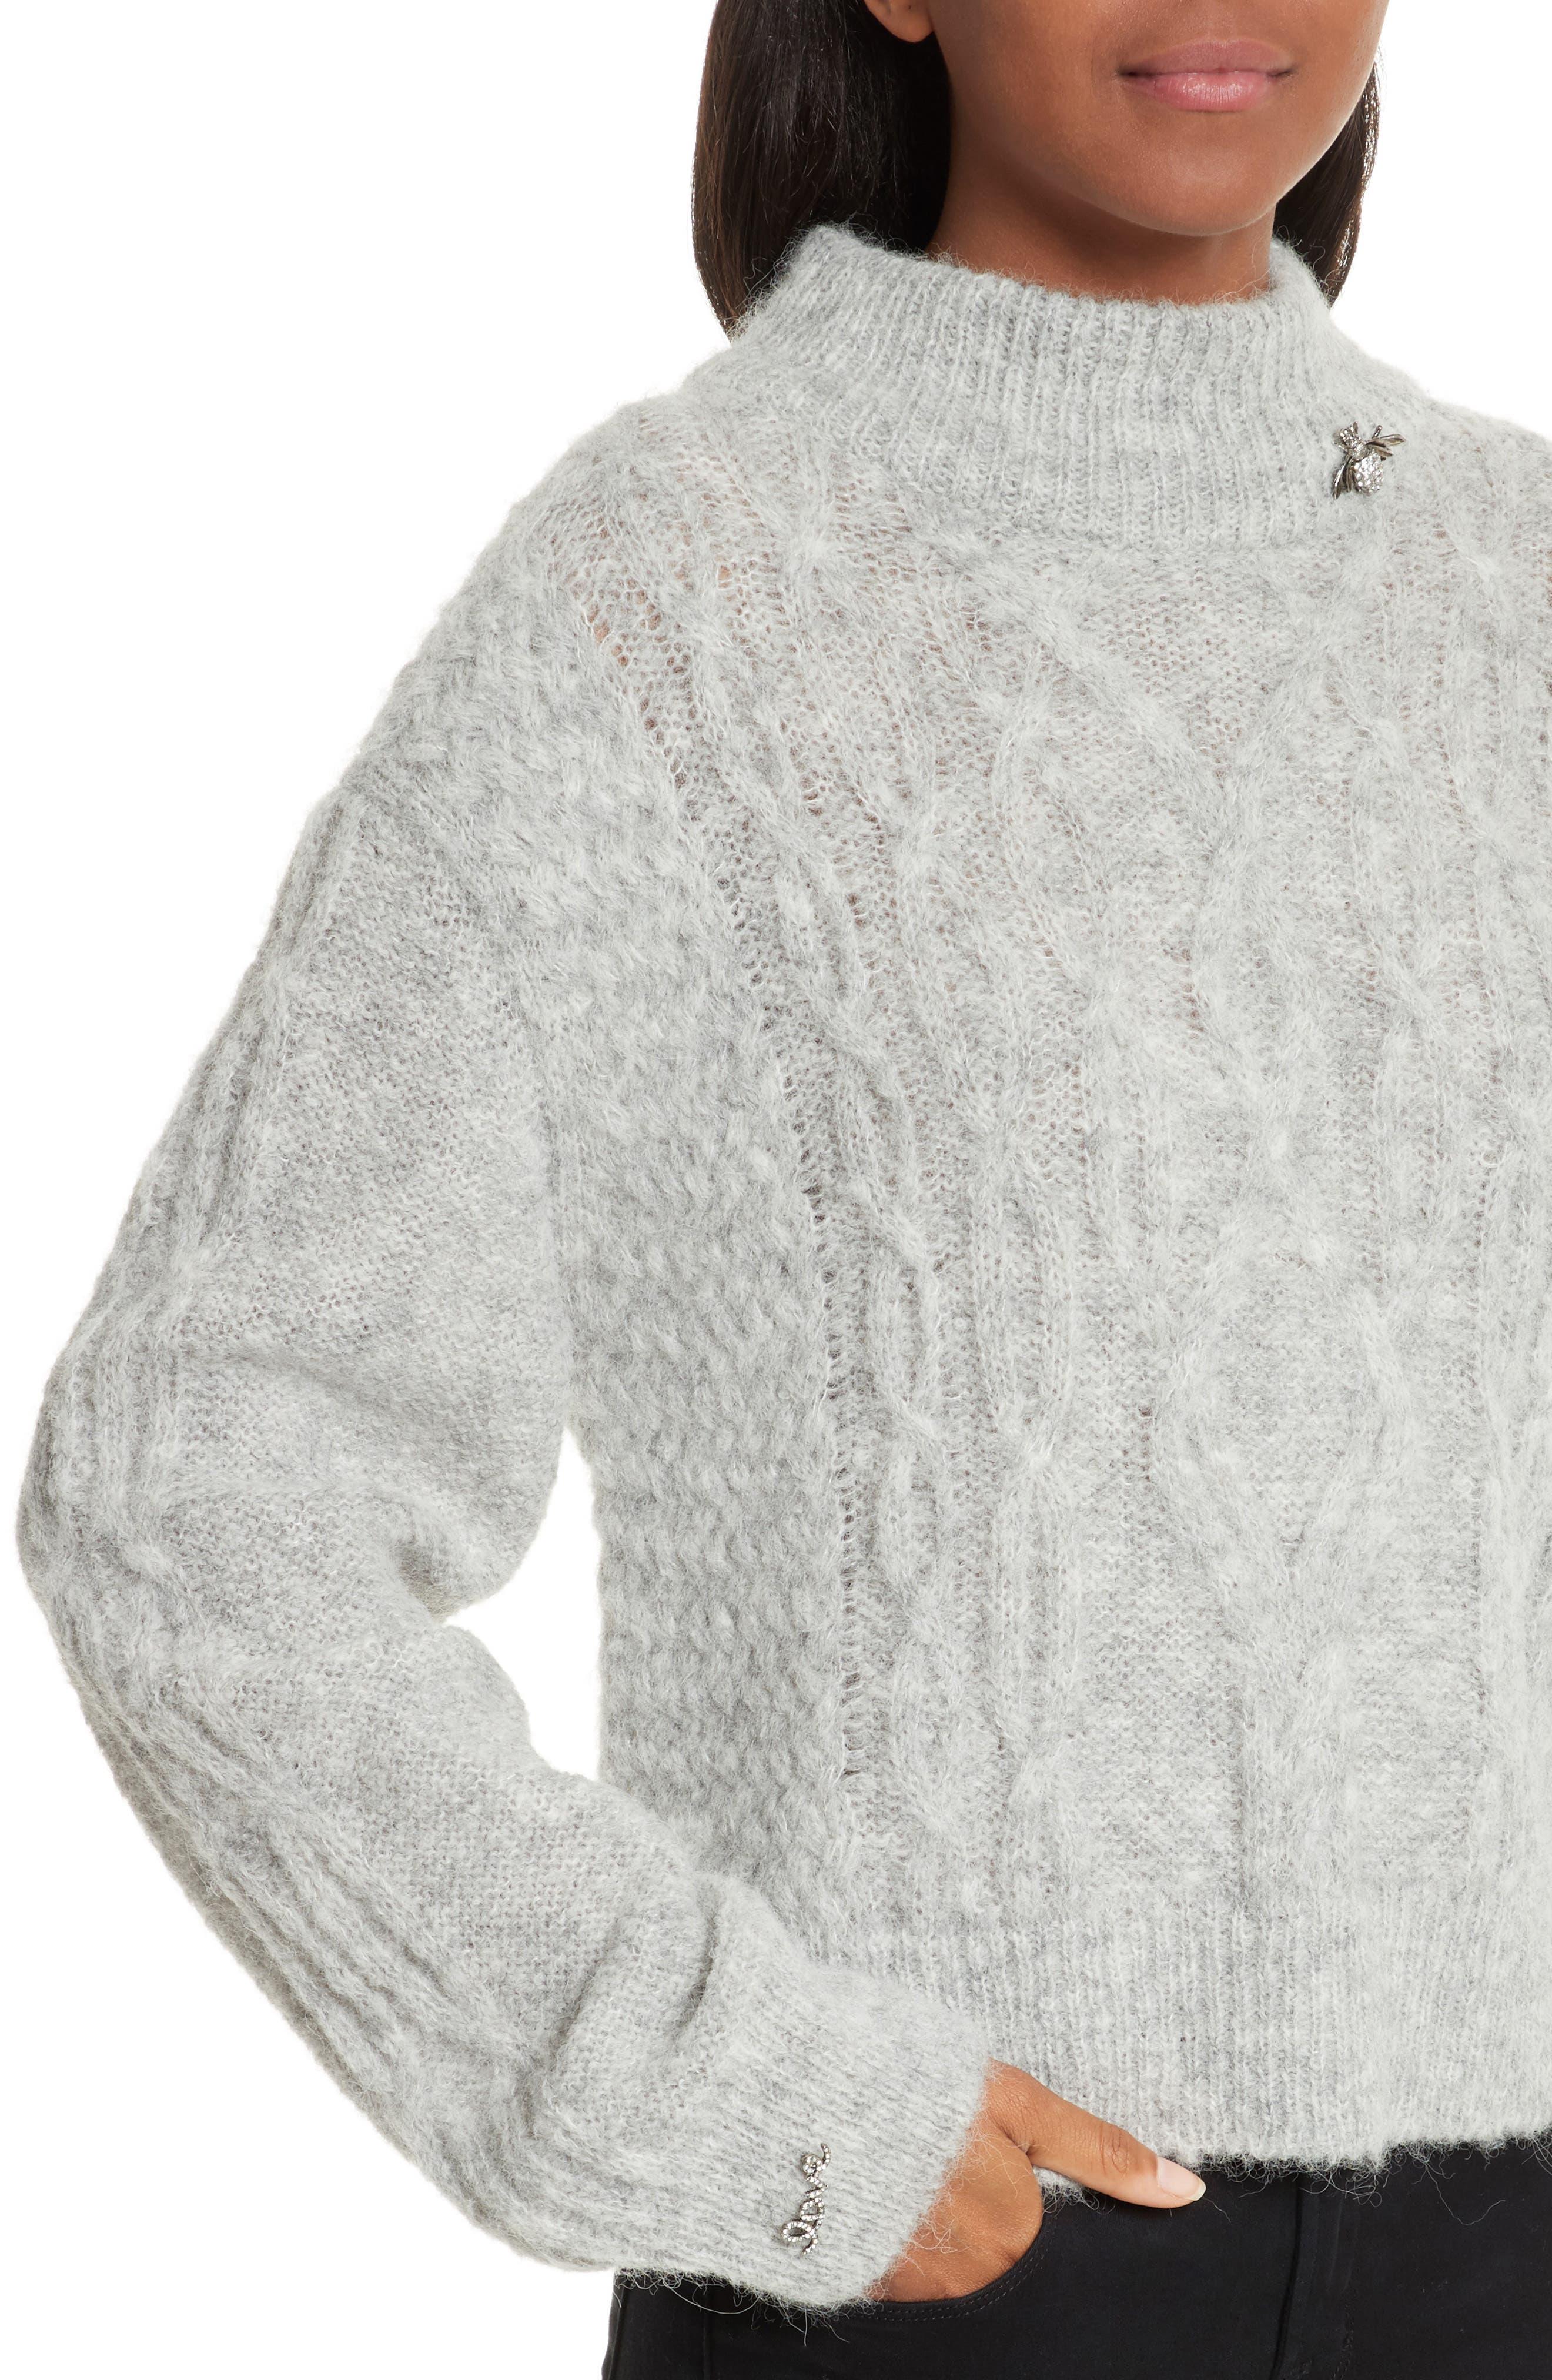 Garlan Mock Neck Sweater,                             Alternate thumbnail 4, color,                             Light Heather Grey